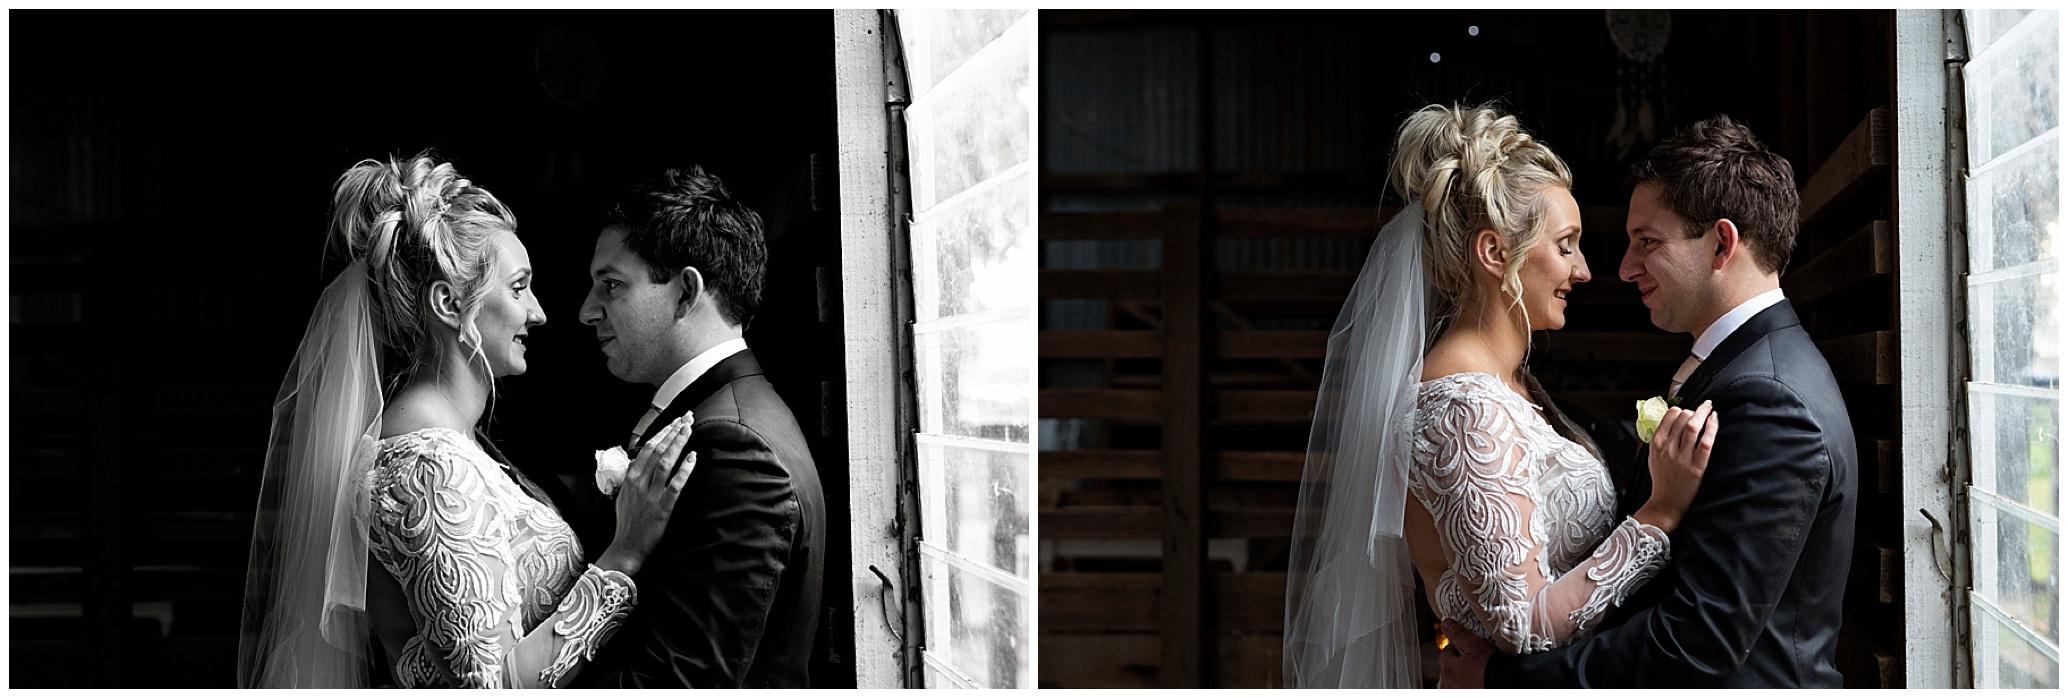 yarrawonga-wedding-photographer_0275.jpg